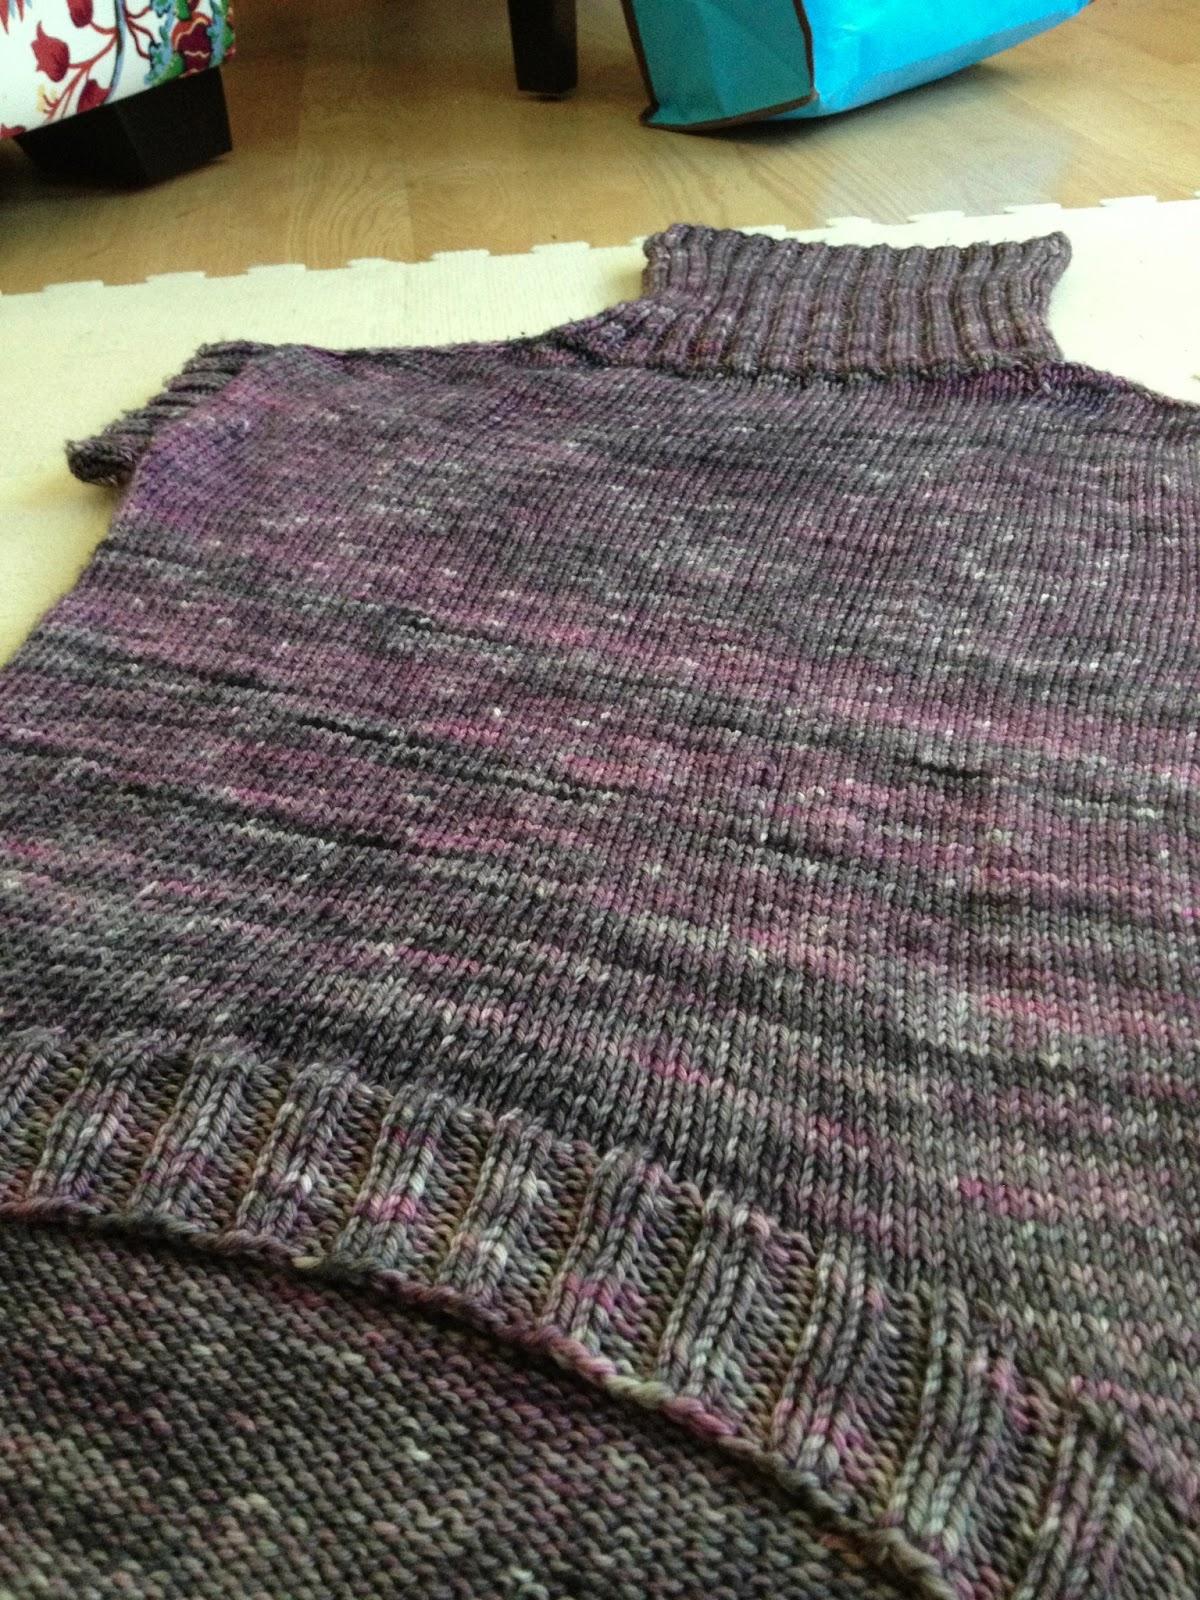 Knitting Pattern Essentials By Sally Melville : Susan B. Anderson: Jun 18, 2013